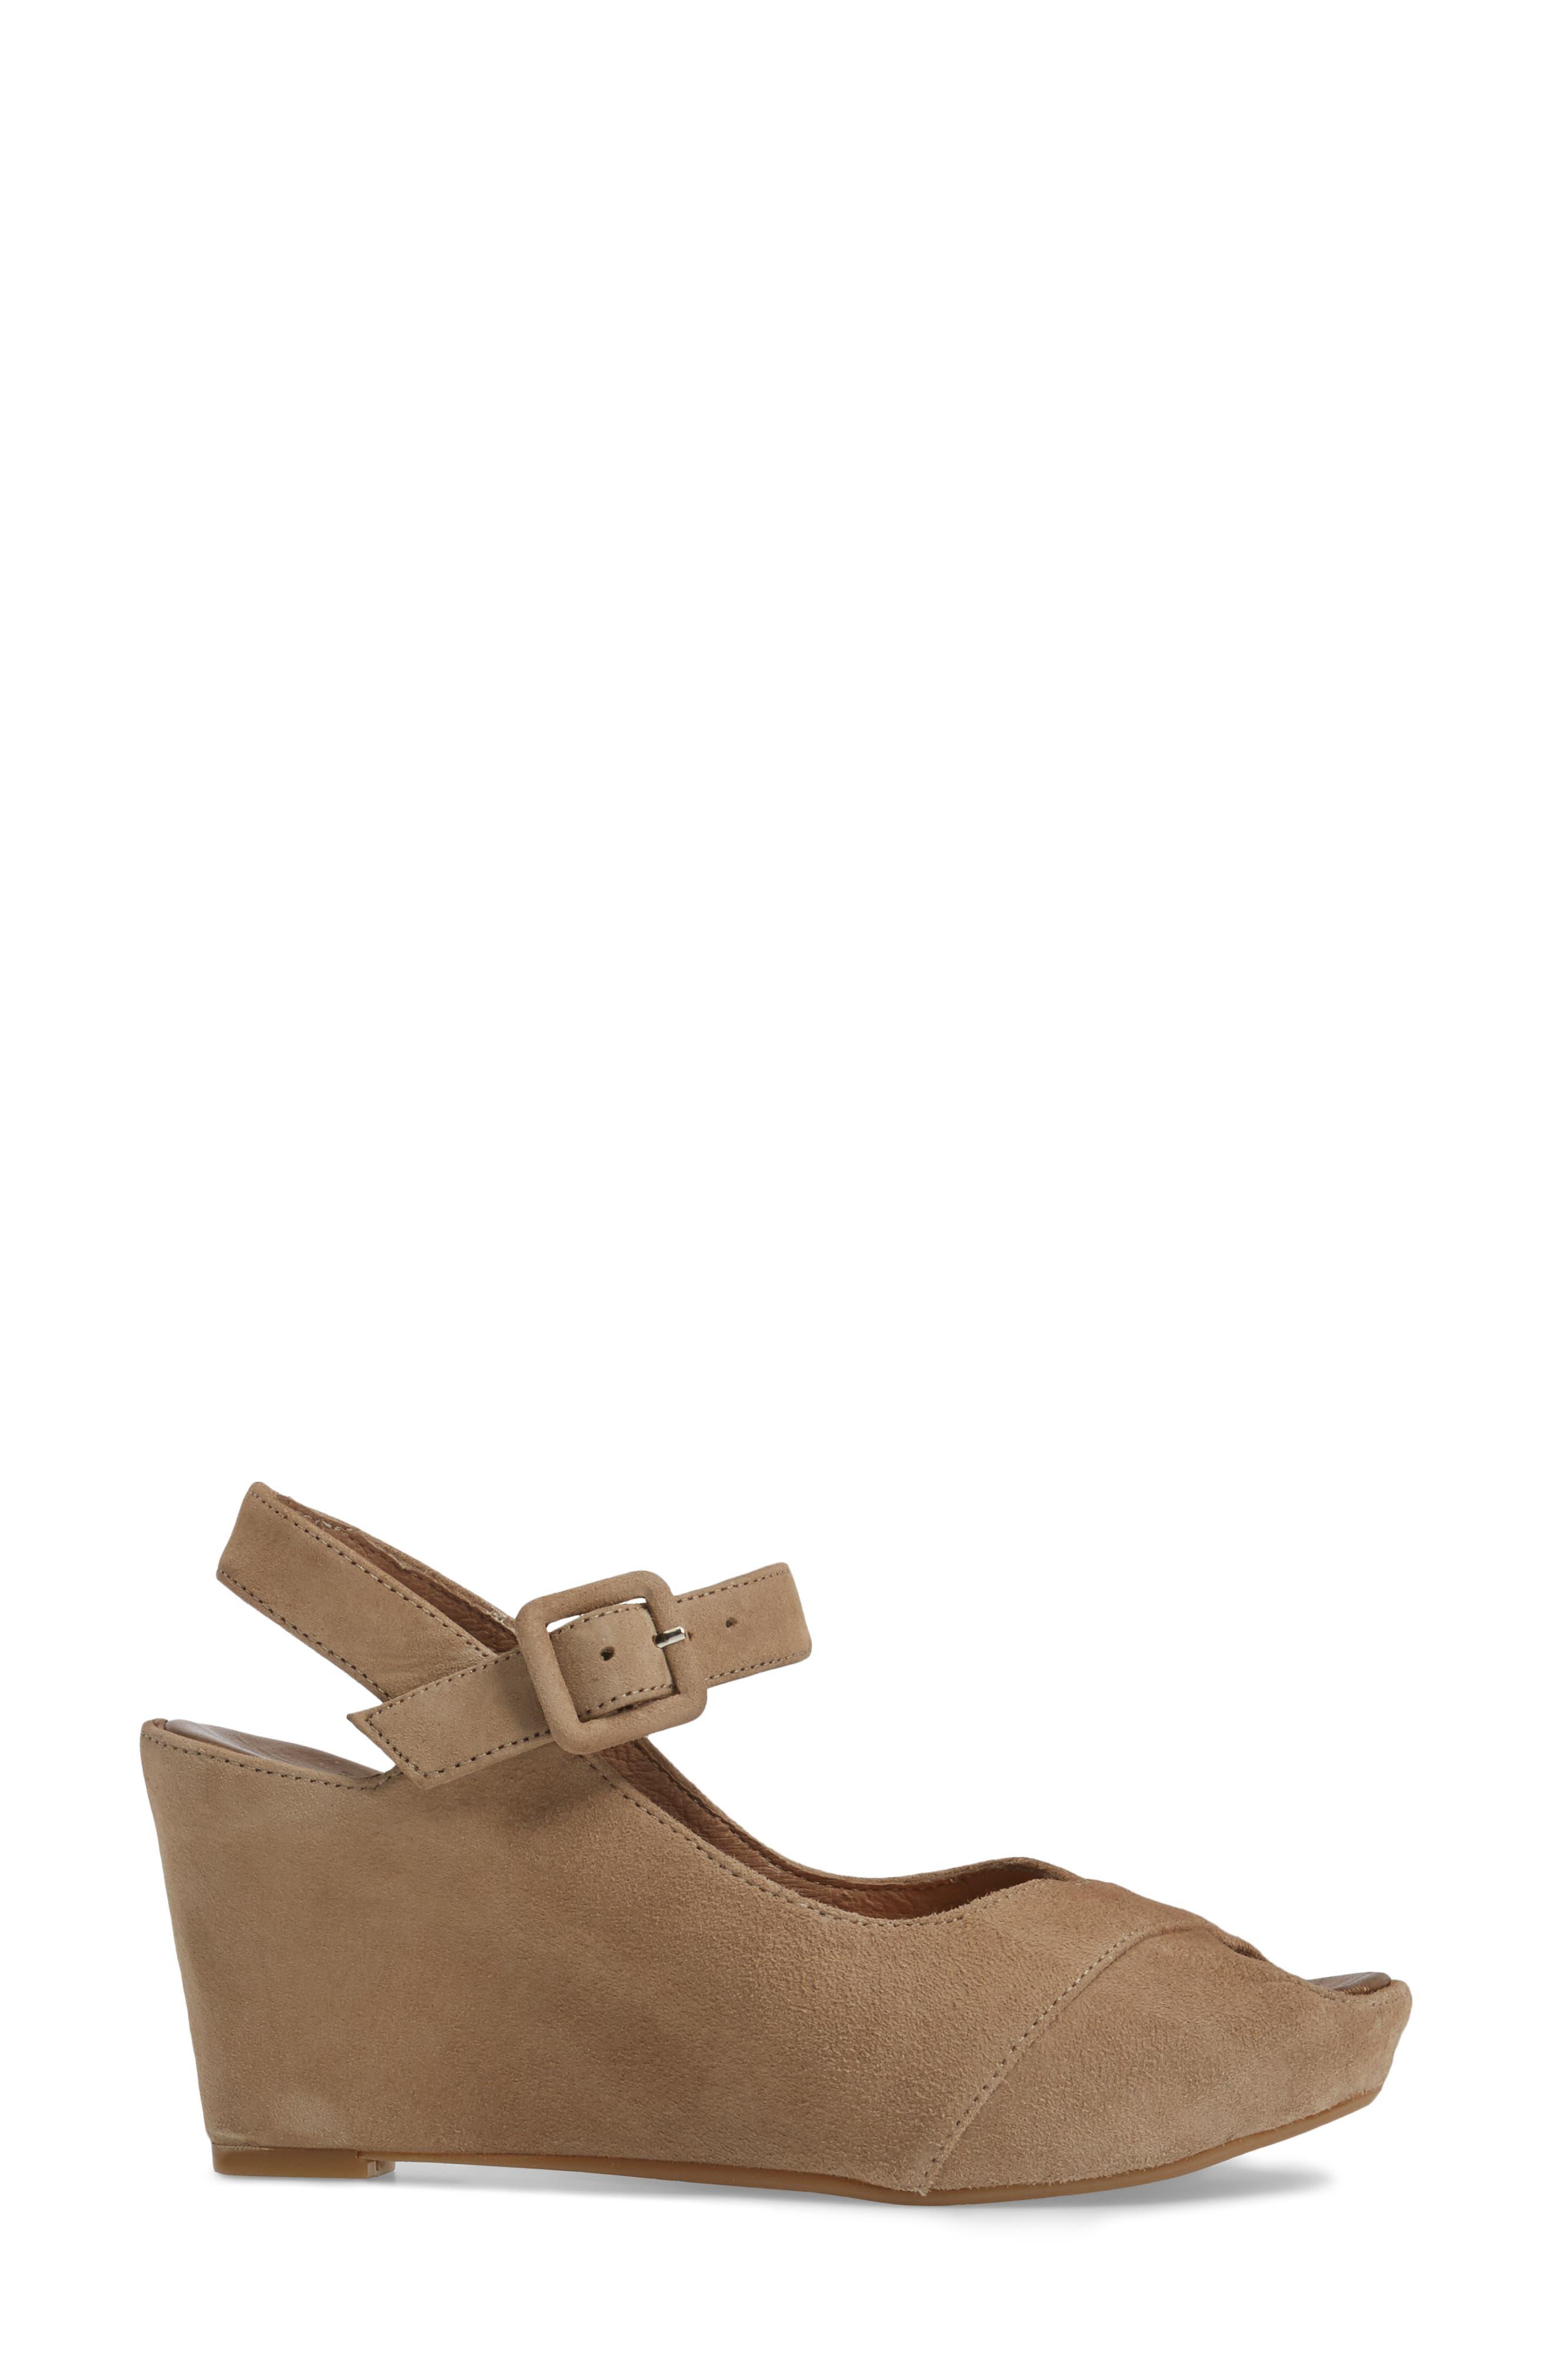 Tara Platform Wedge Sandal,                             Alternate thumbnail 3, color,                             Taupe Suede